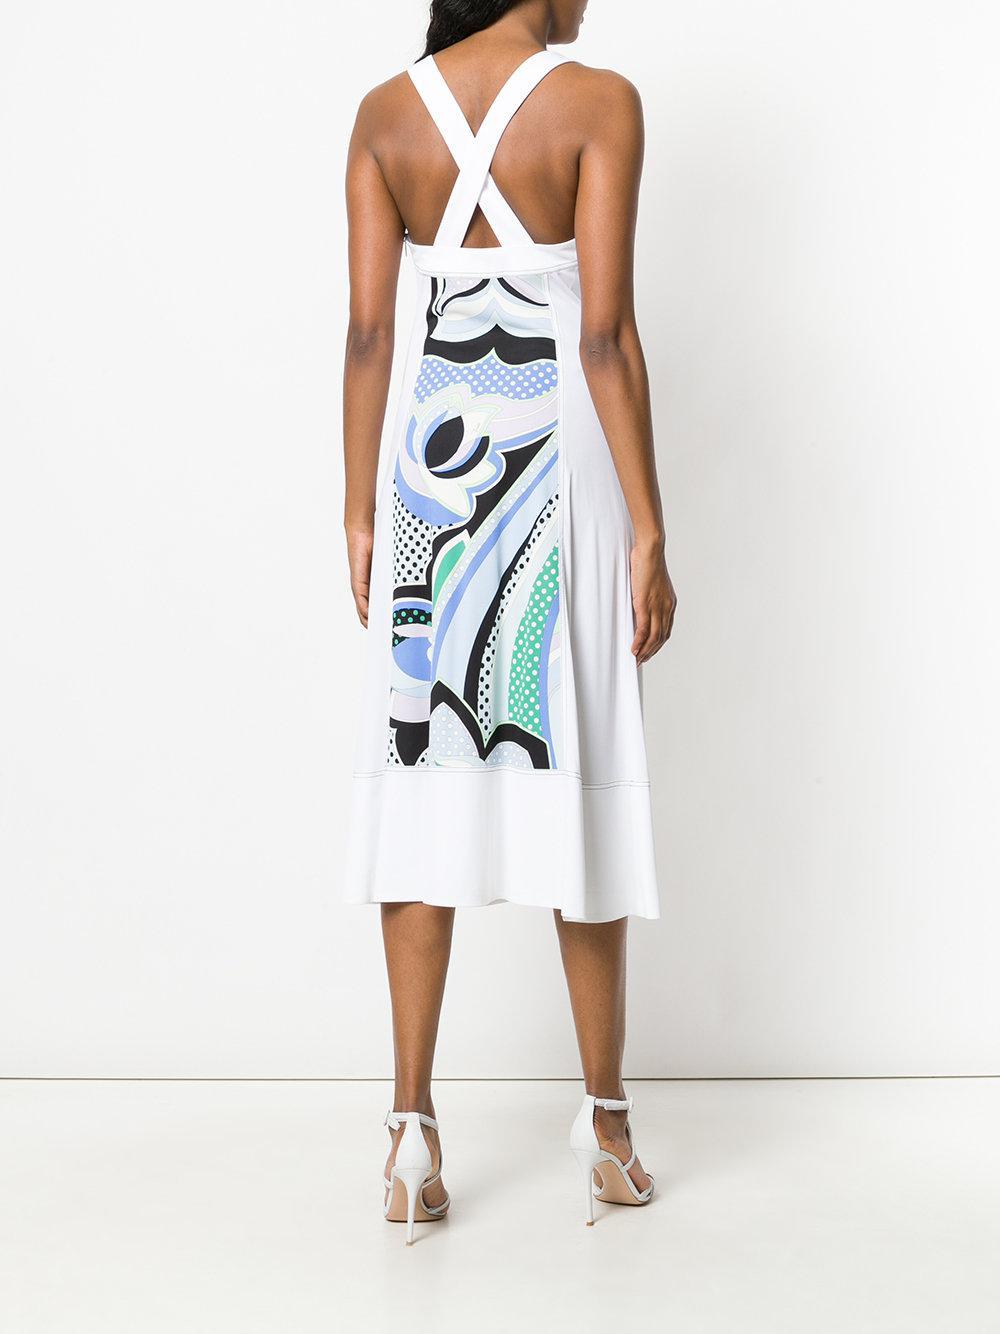 embellished printed-panel midi dress - Multicolour Emilio Pucci 9WdfjbKD